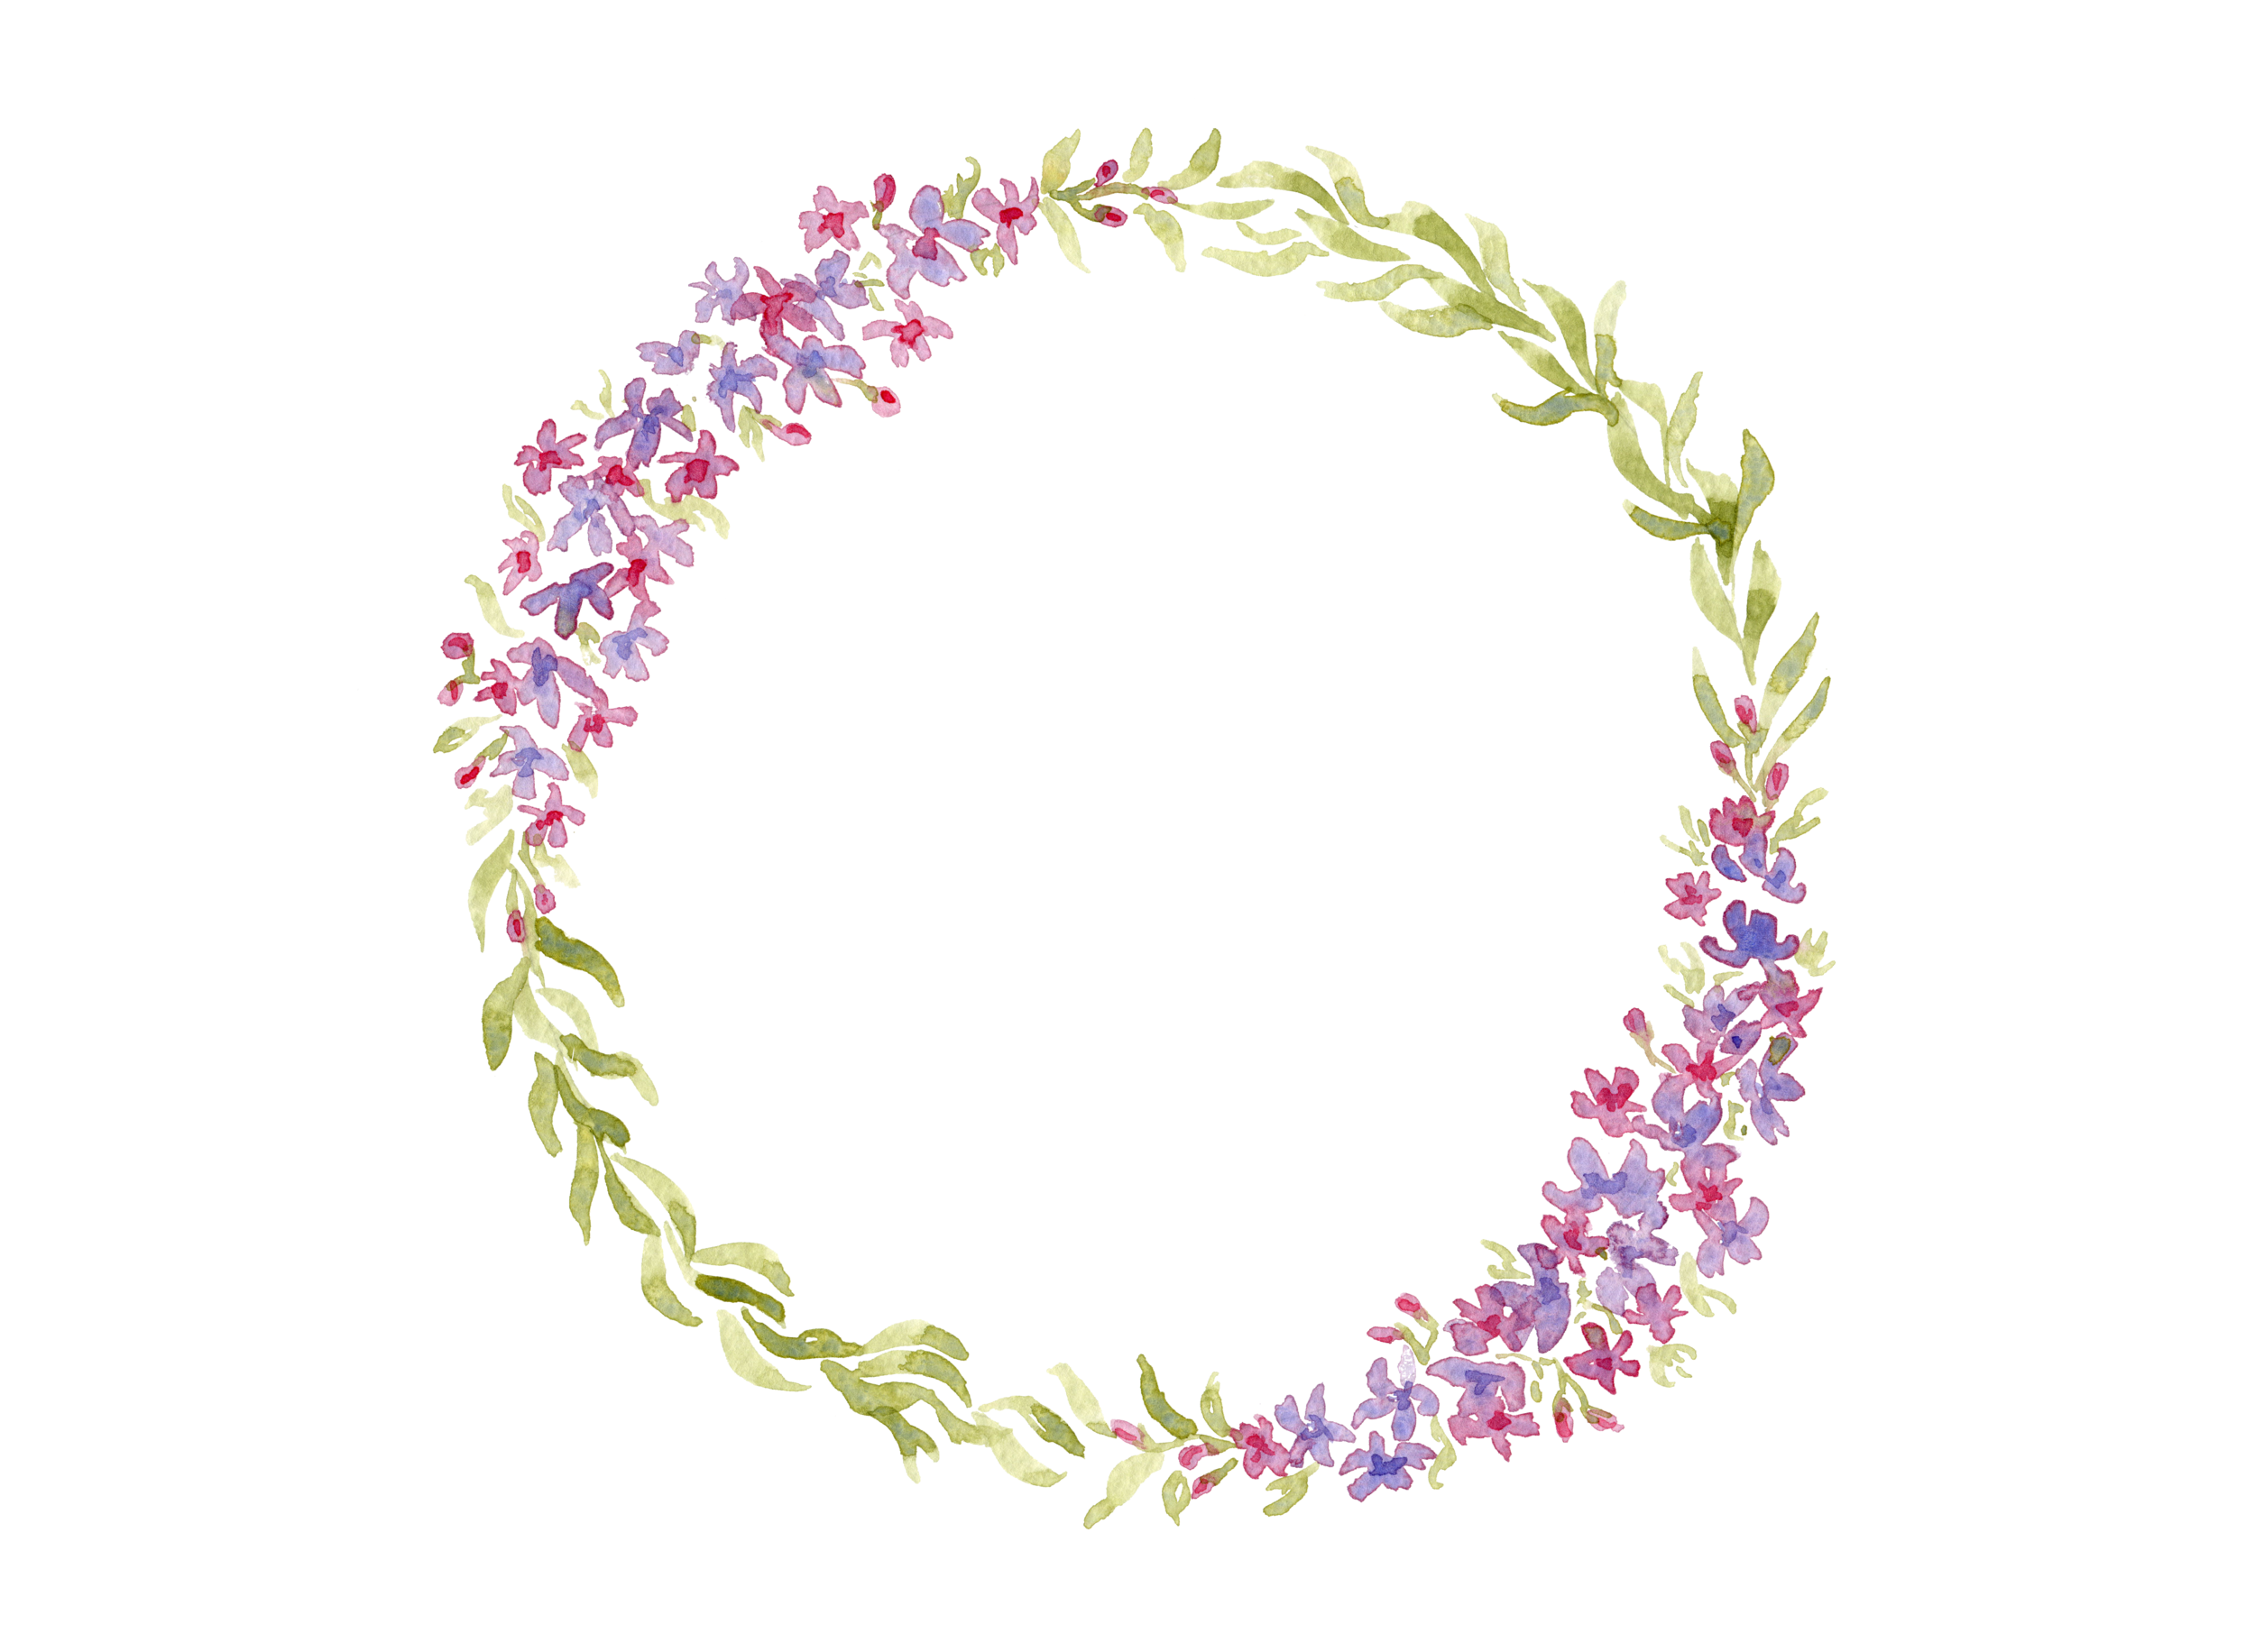 purple_wreath.png